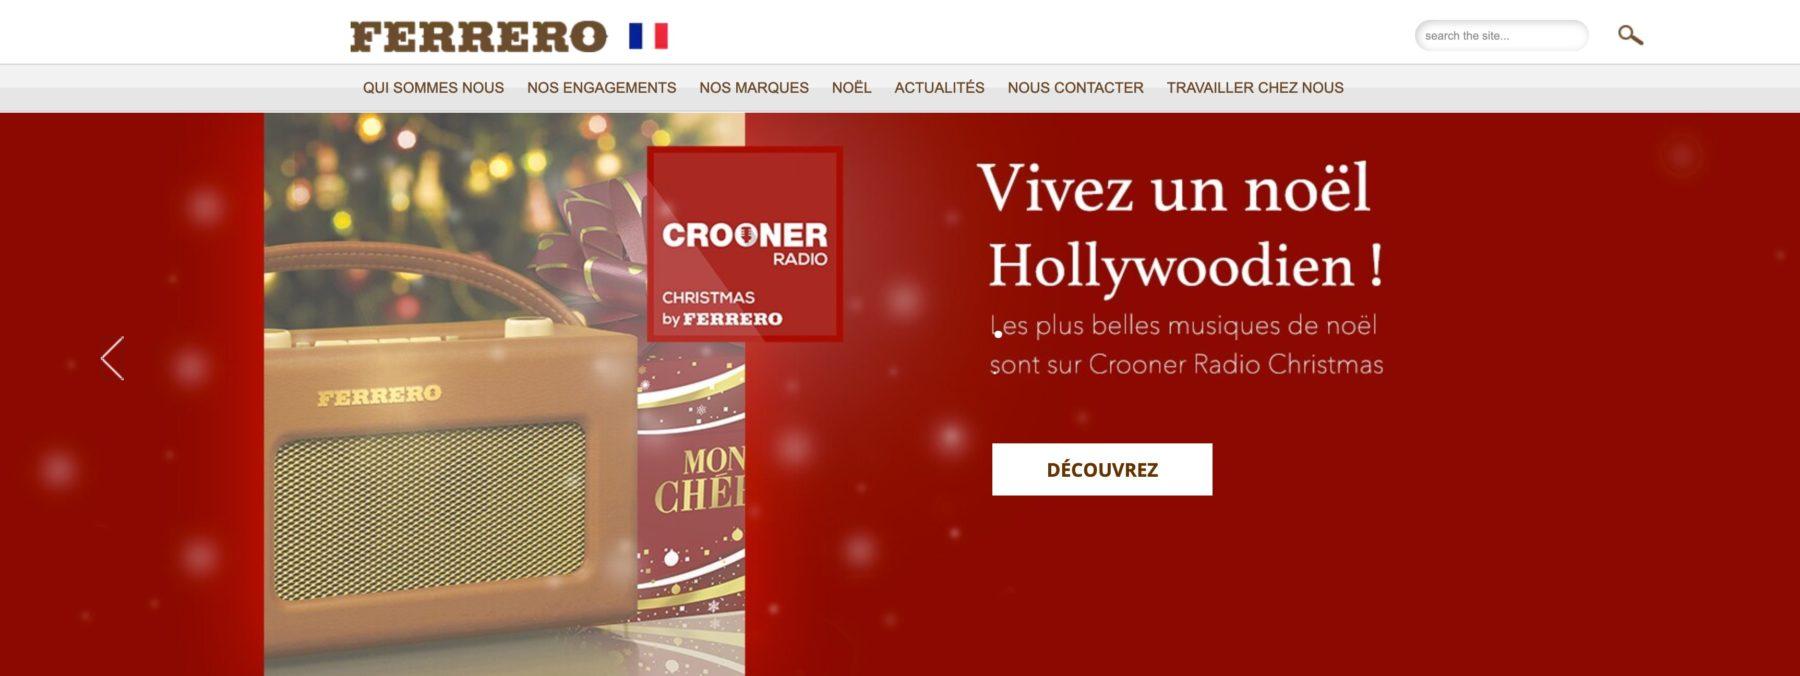 Crooner_Radio_Ferrero_Banner